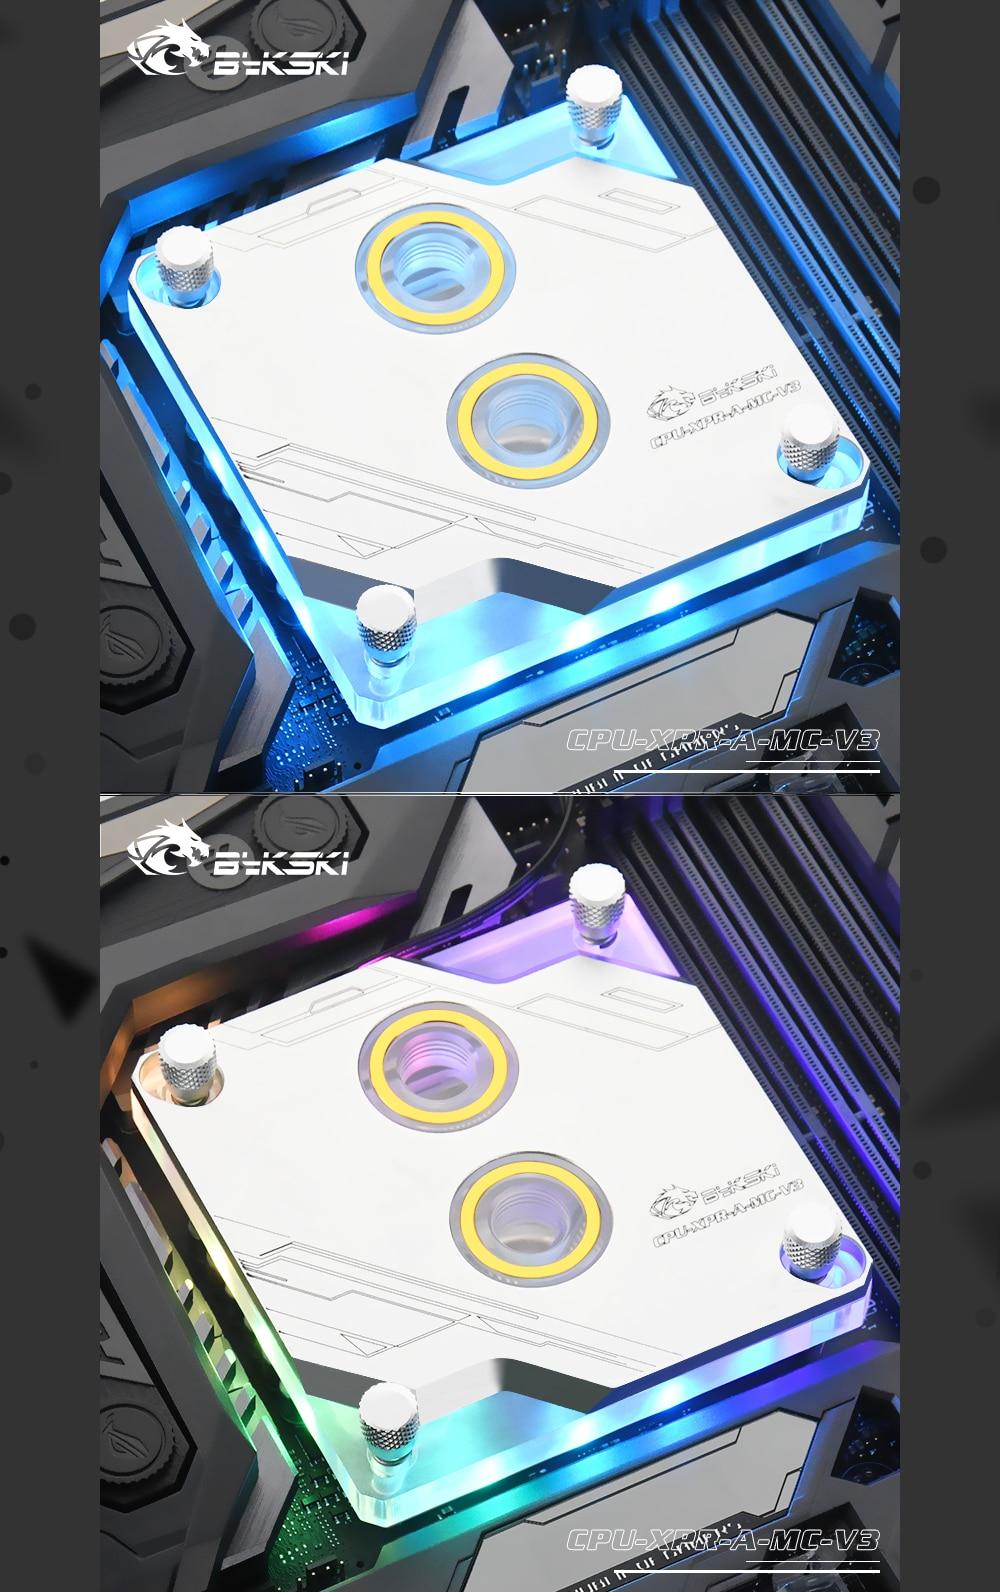 Bykski CPU-XPR-A-MC-V3 For Intel Lga115x/2011 CPU Water Blocks RBW Lighting System Microwaterway Water Cooling Block